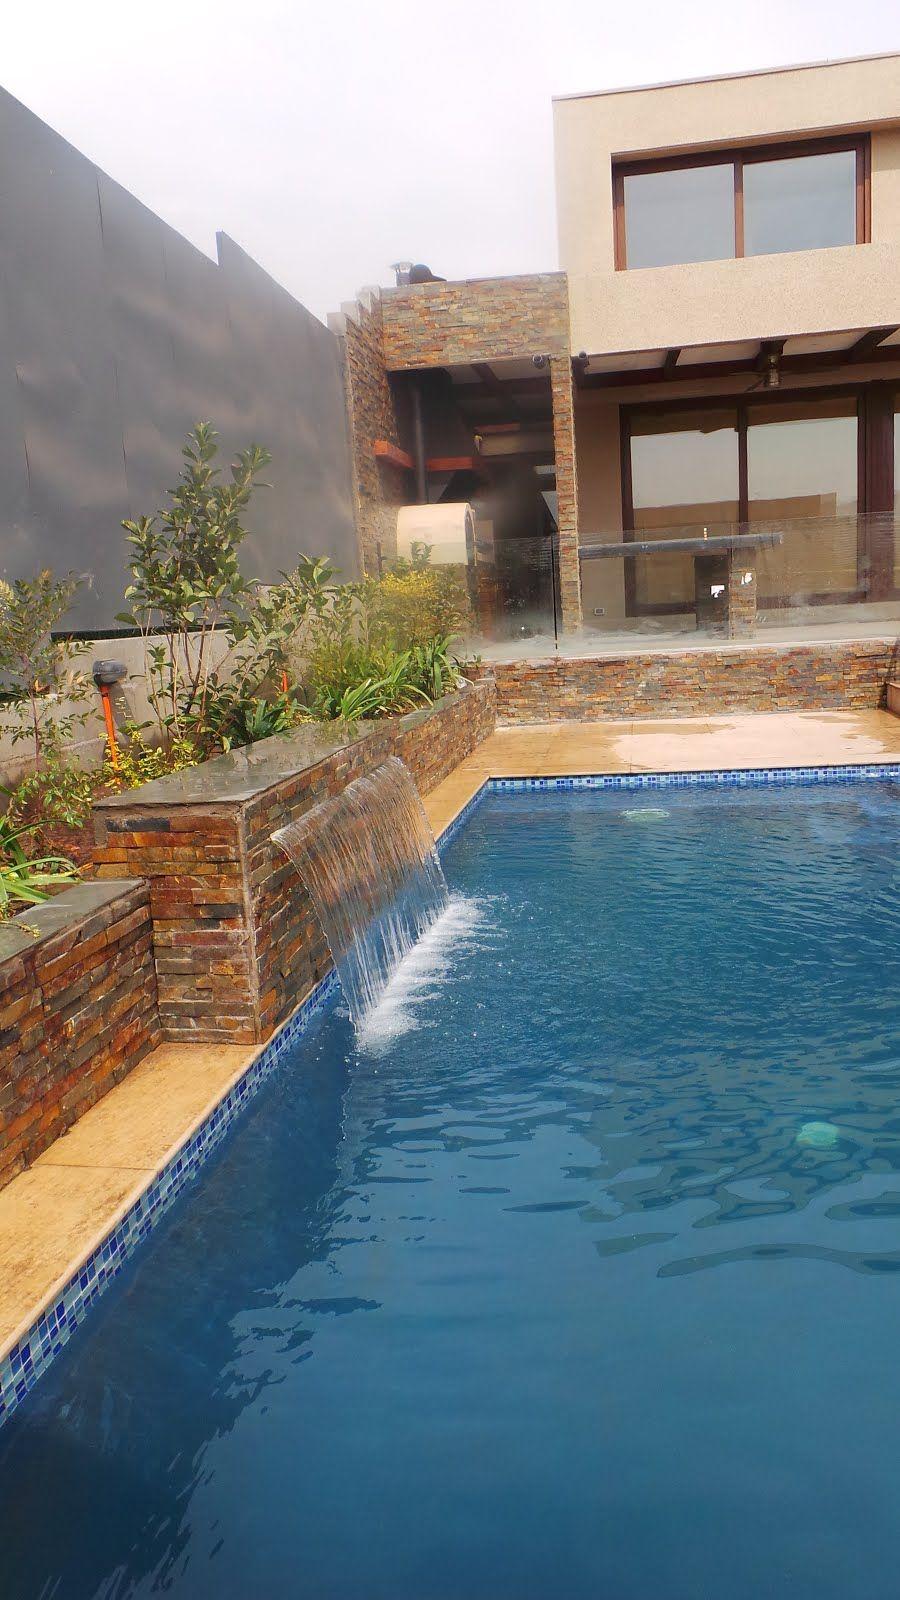 piscina p santander home pinterest yards garden On piscinas santander